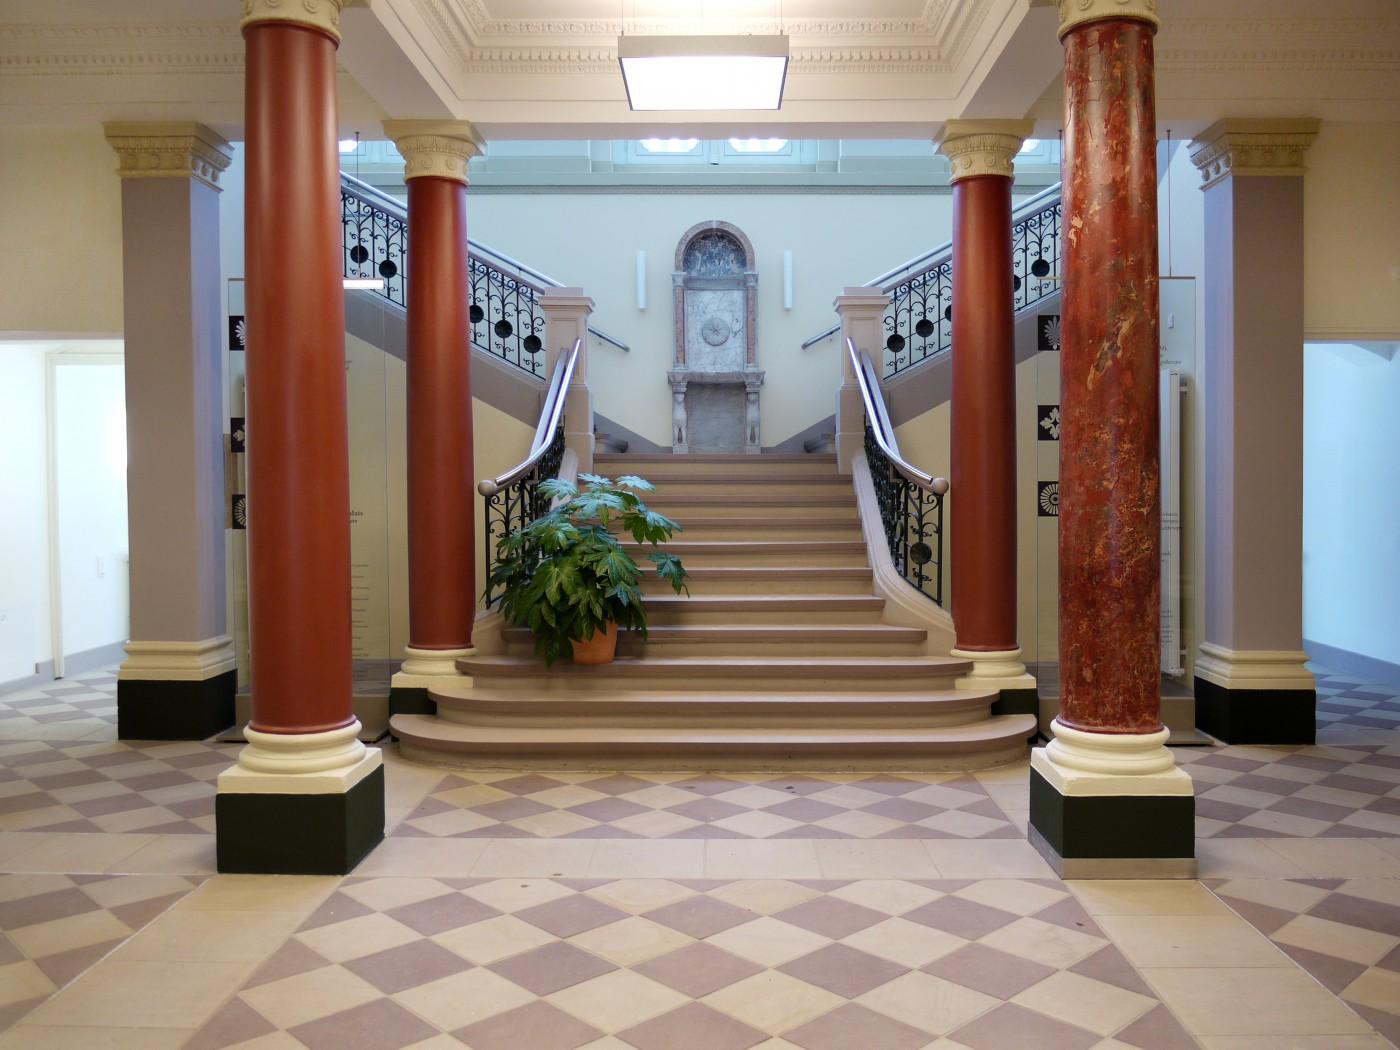 Grosses palais b ro f r design innenarchitektur for Design innenarchitektur